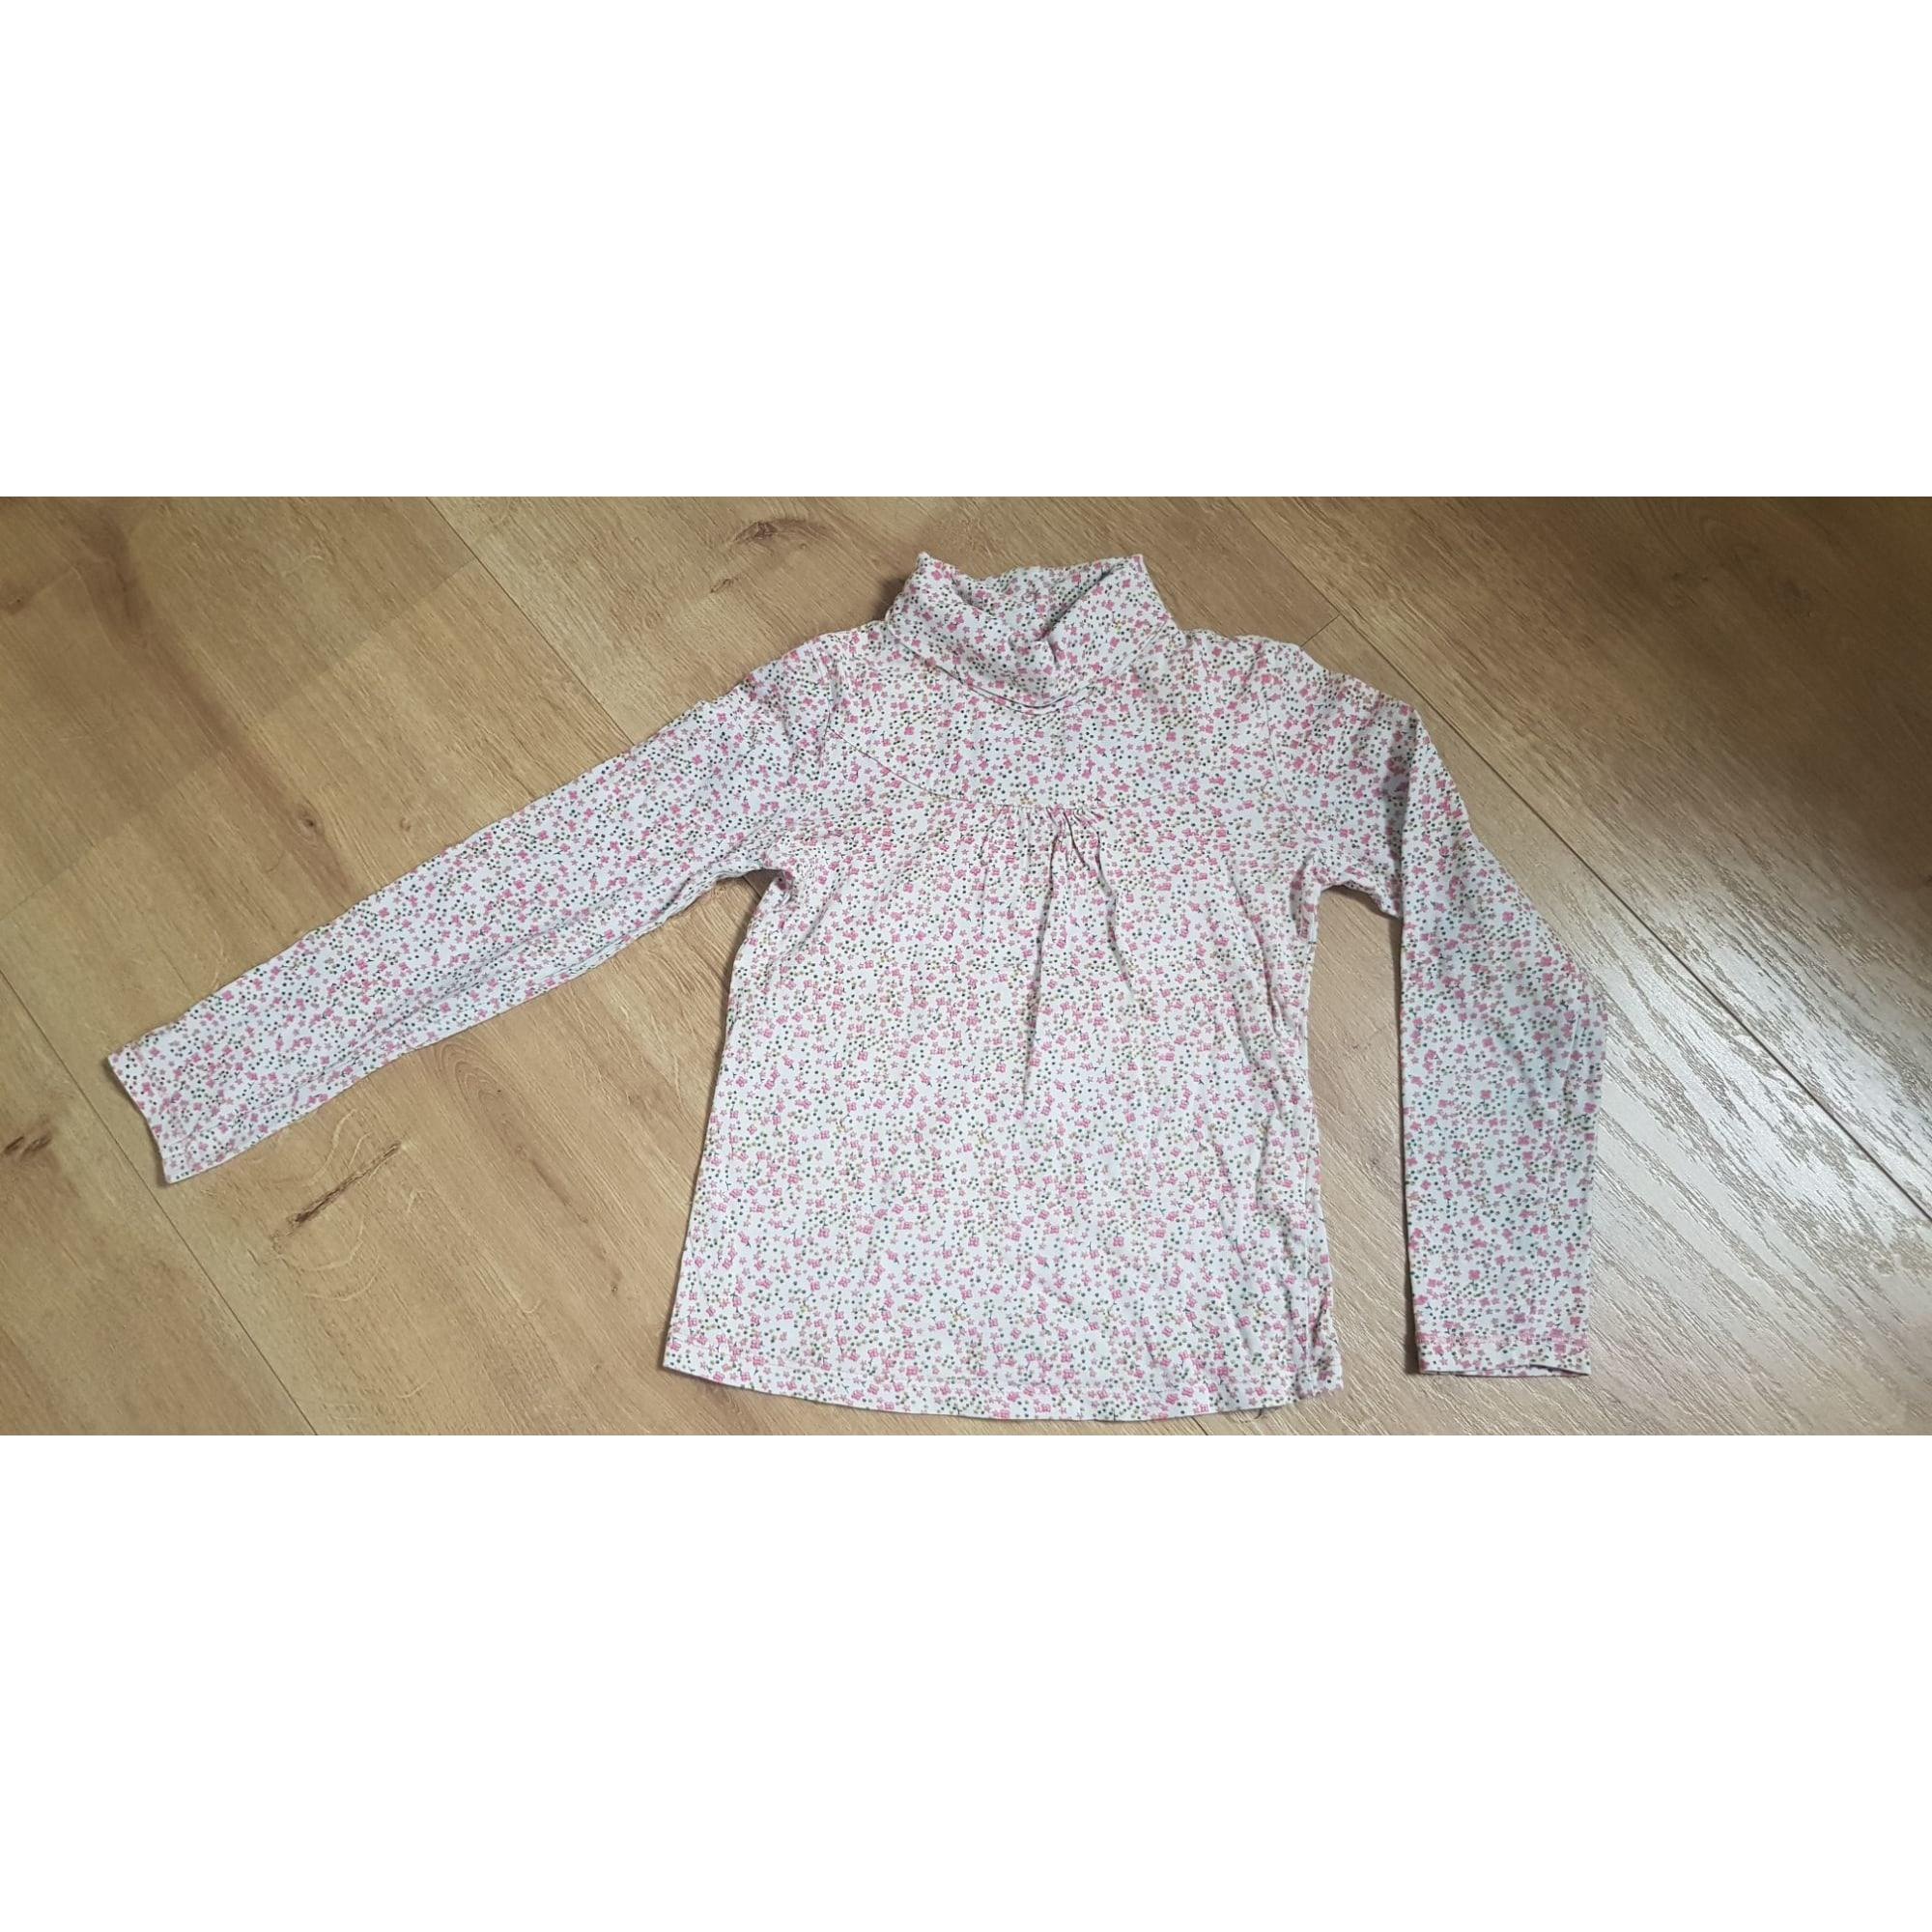 Top, Tee-shirt LISA ROSE Rose, fuschia, vieux rose